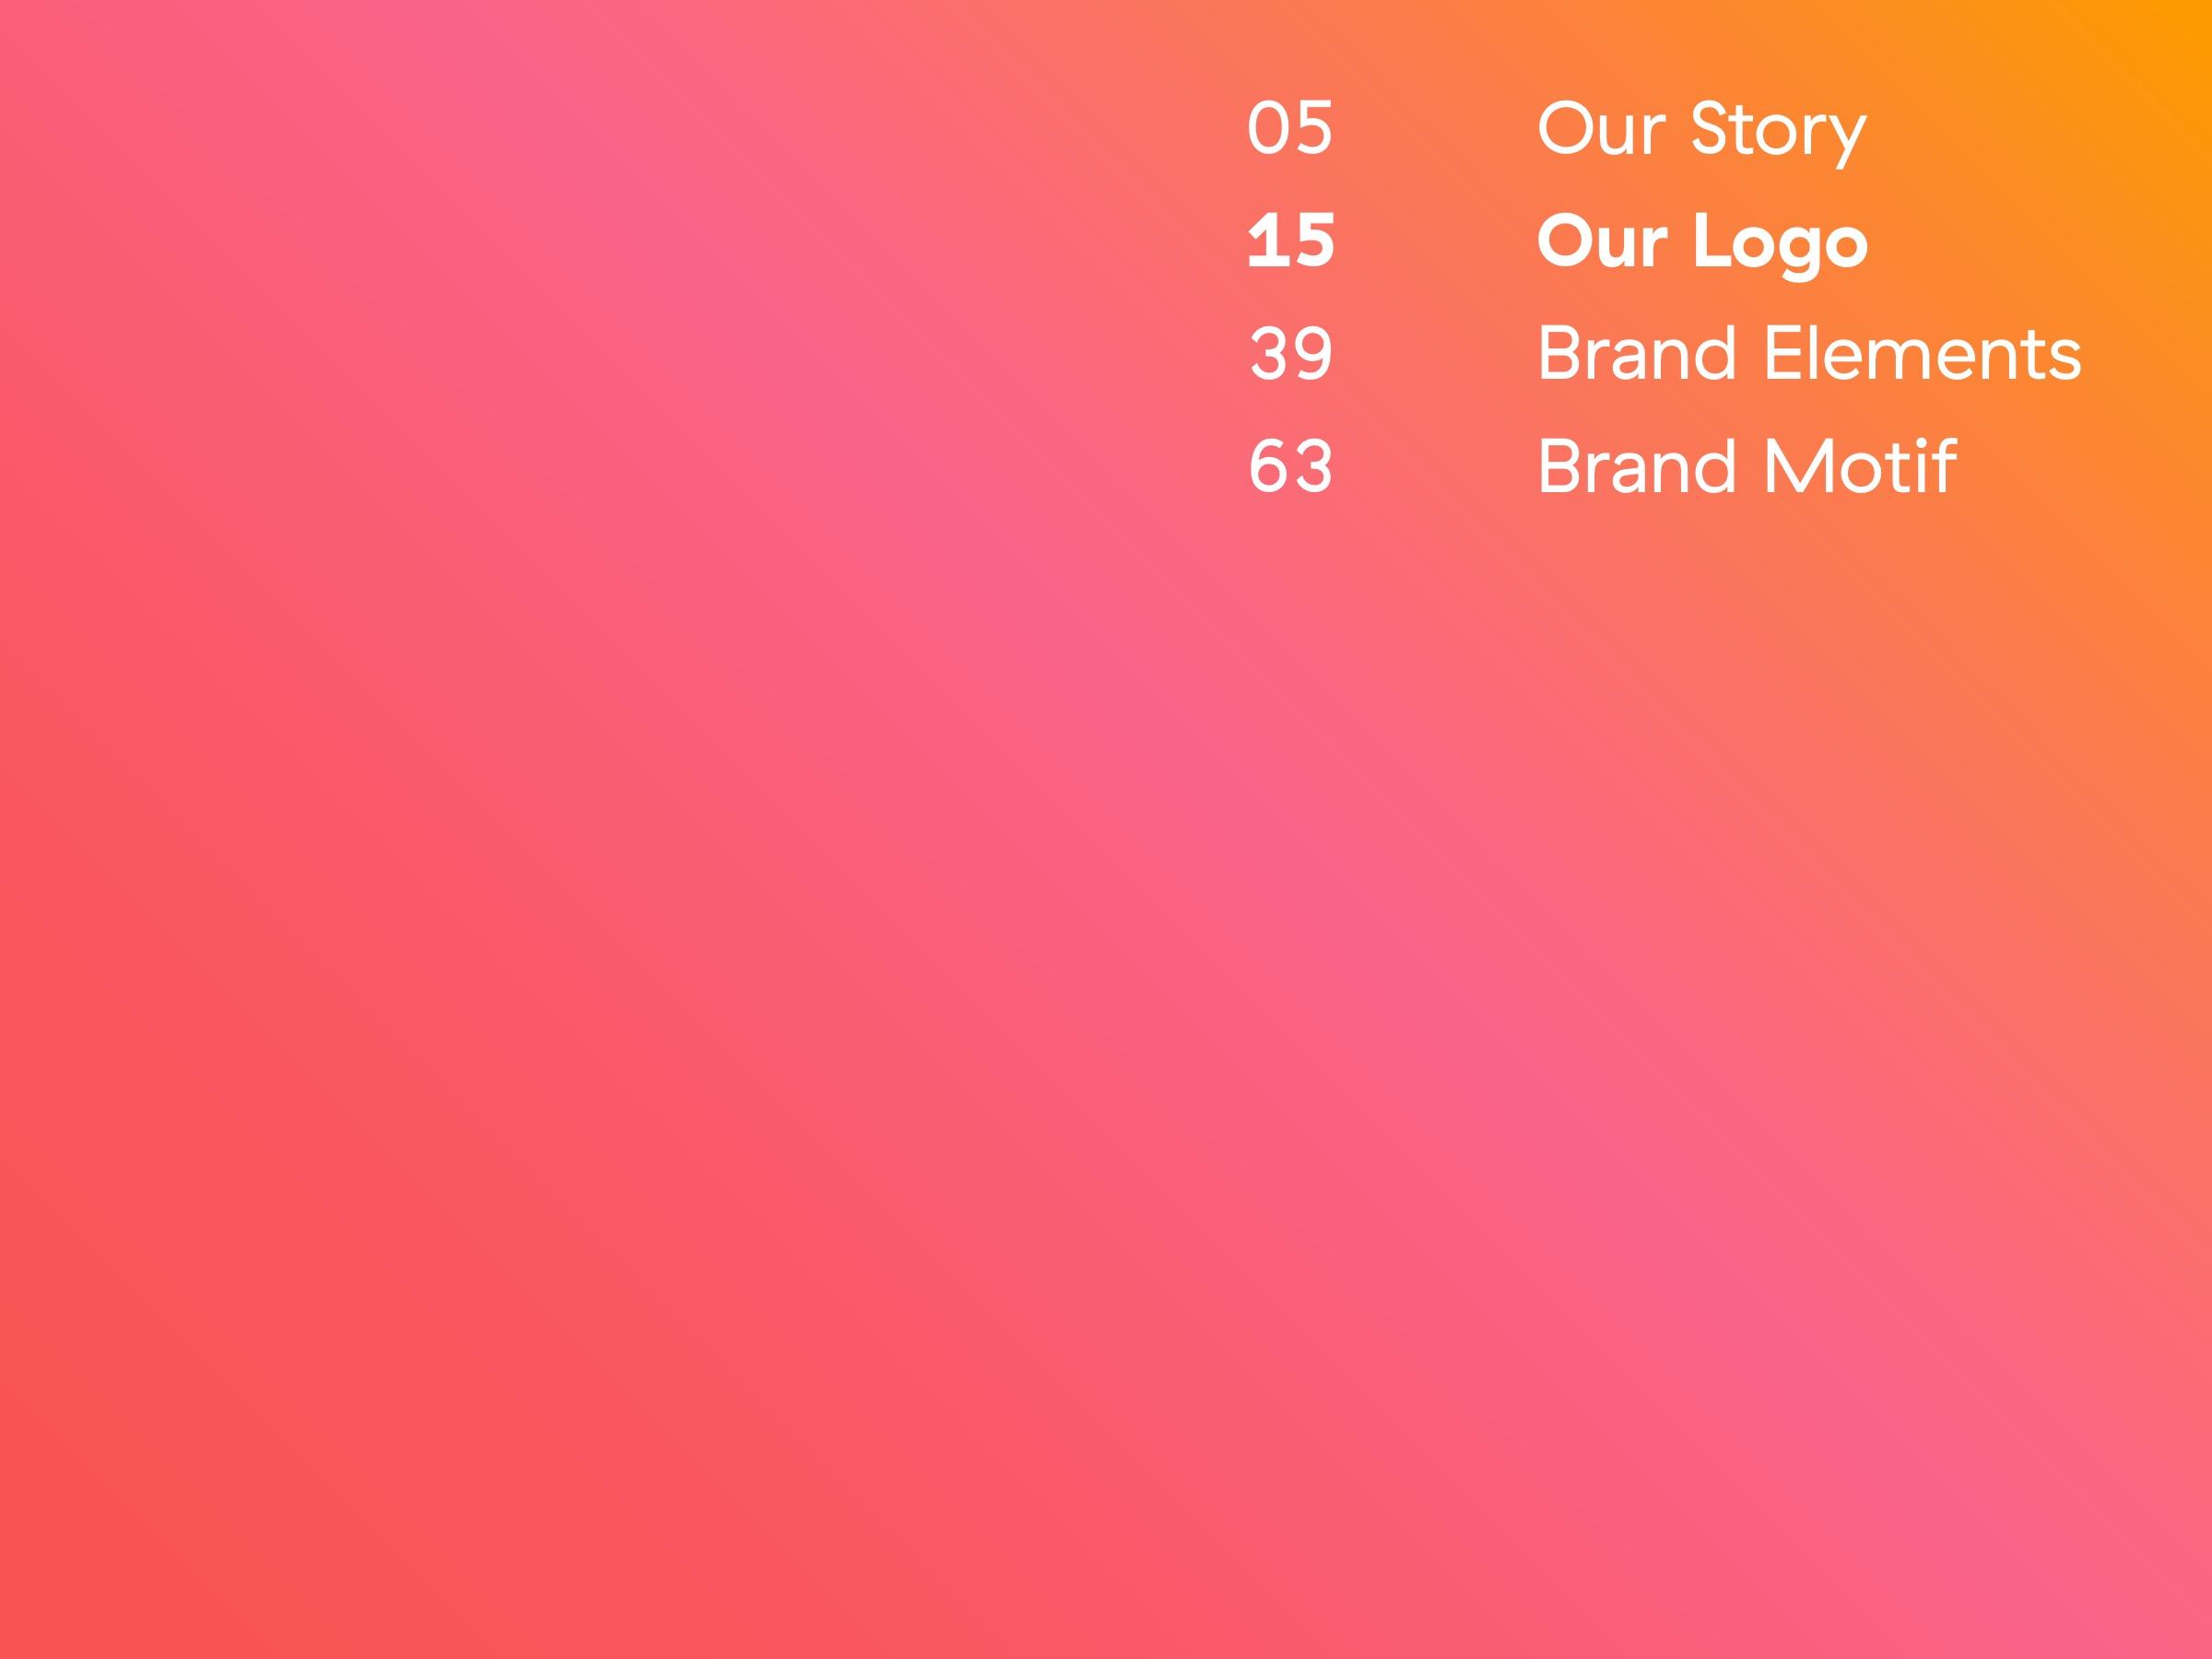 Asana-Brandbook-v1b 53.jpeg